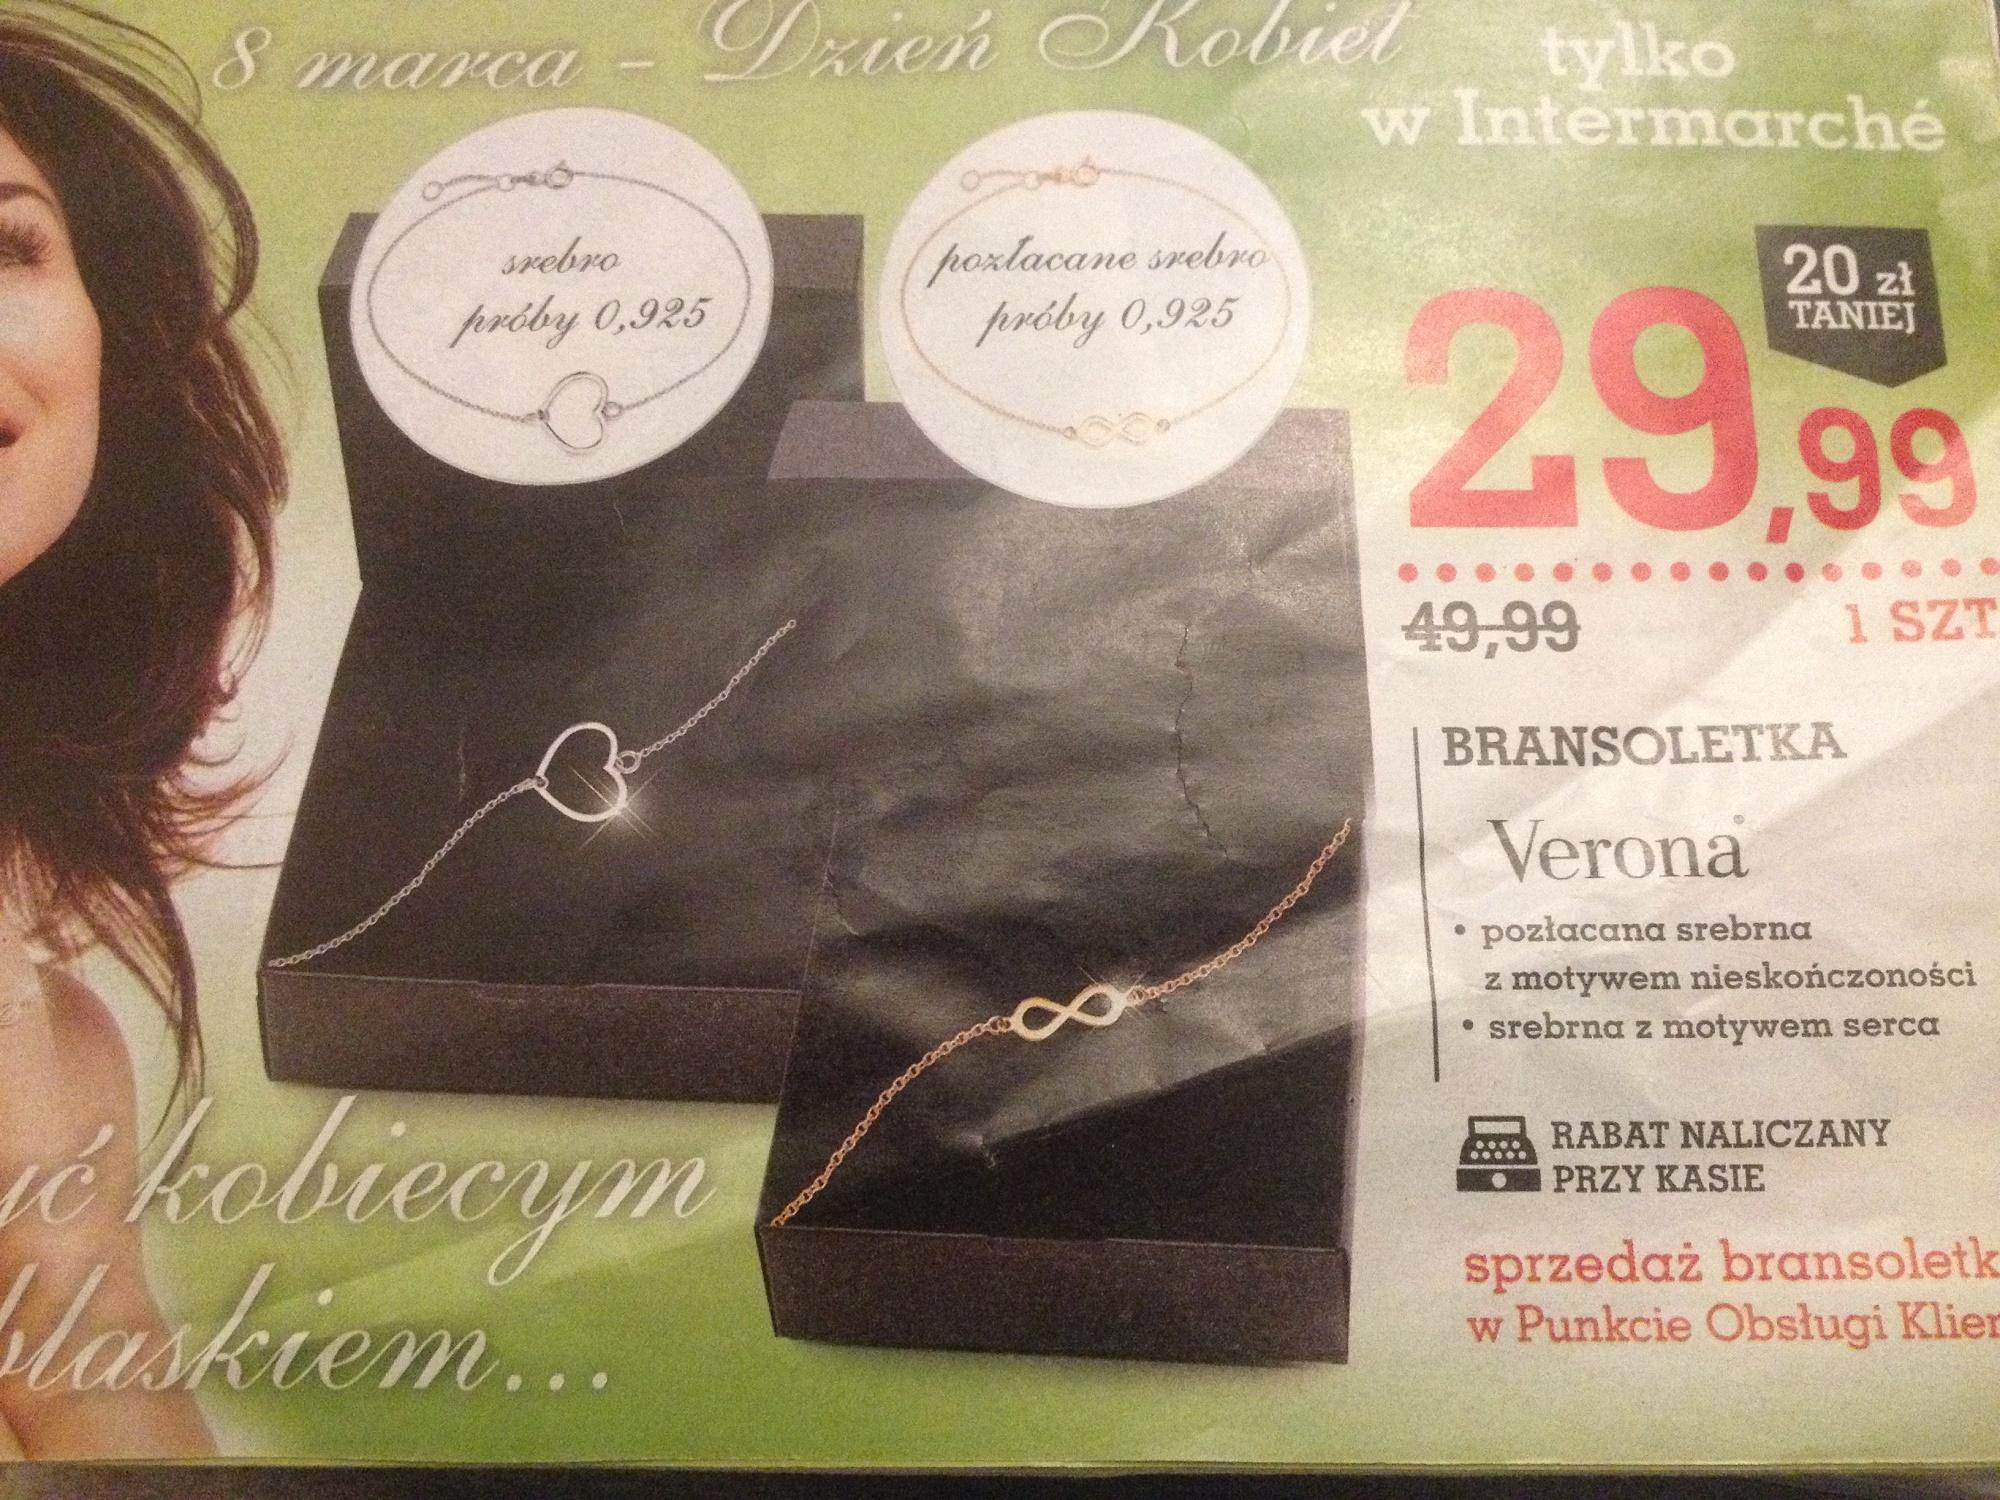 Srebrne bransoletki (próba 925) za 29,99zł @ Intermache